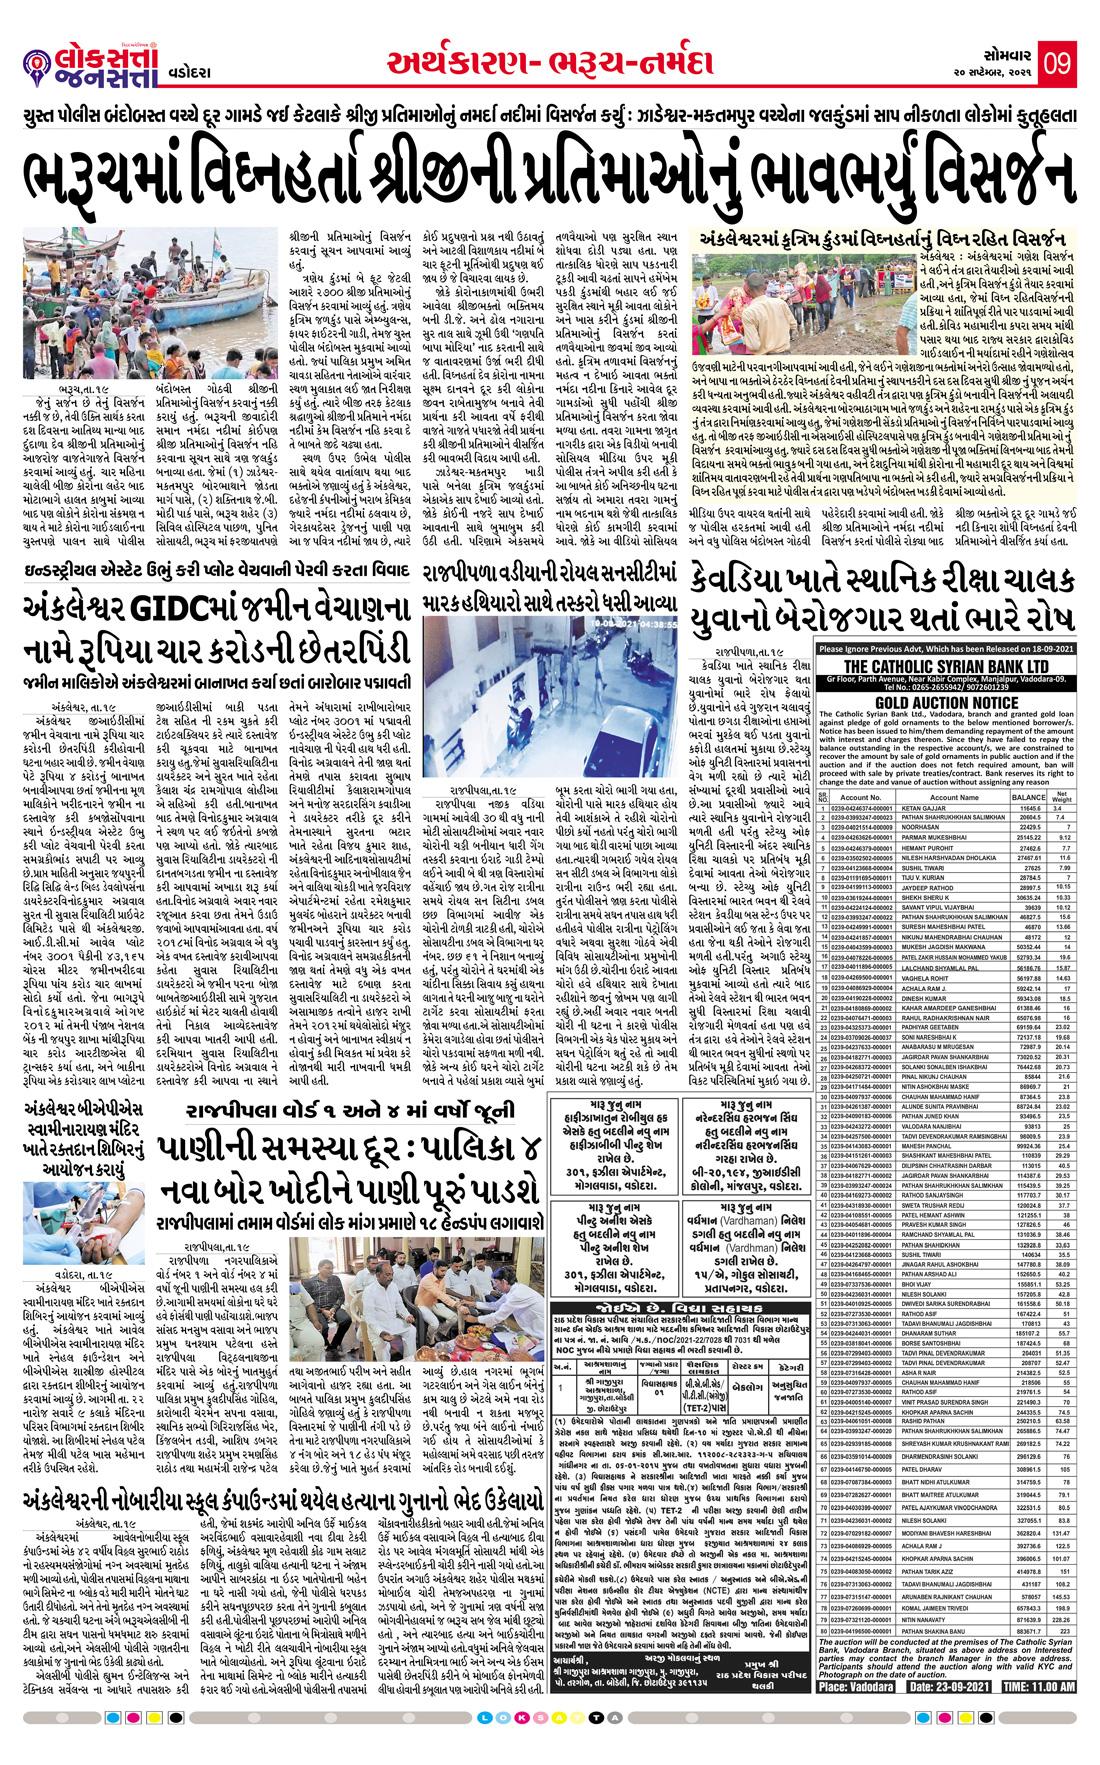 Loksatta Jansatta News Papaer E-paper dated 2021-09-20 | Page 9